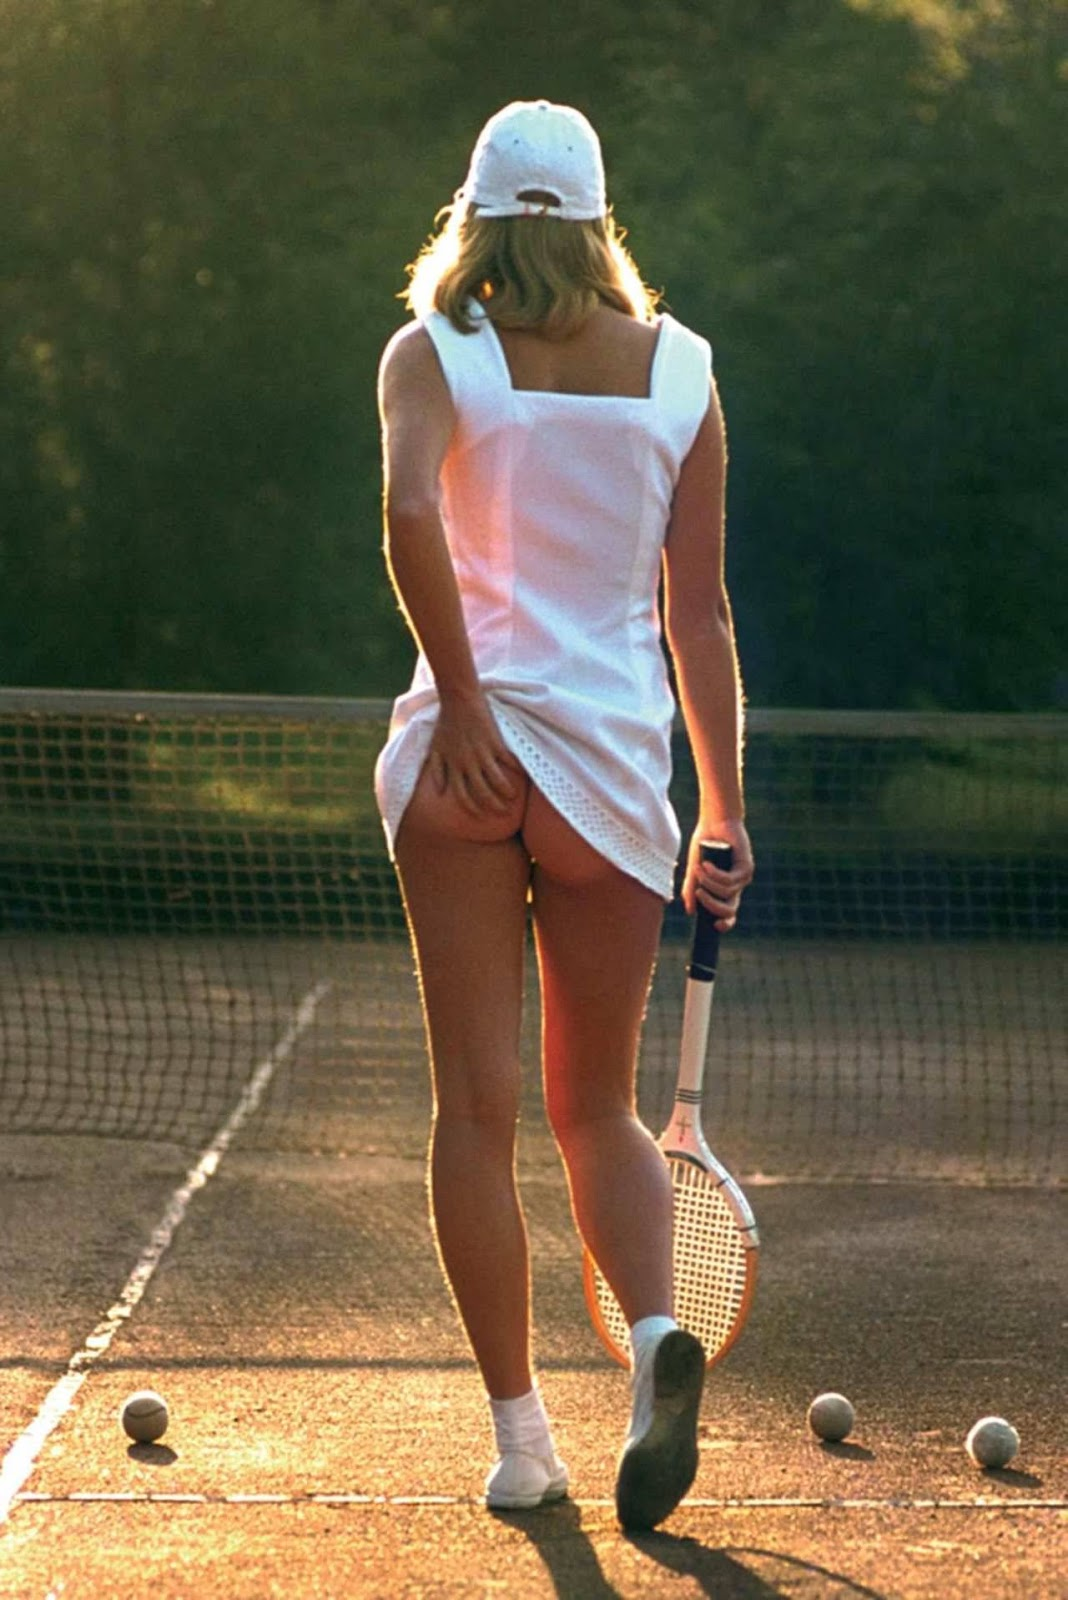 An Iconic Tennis Girl photo